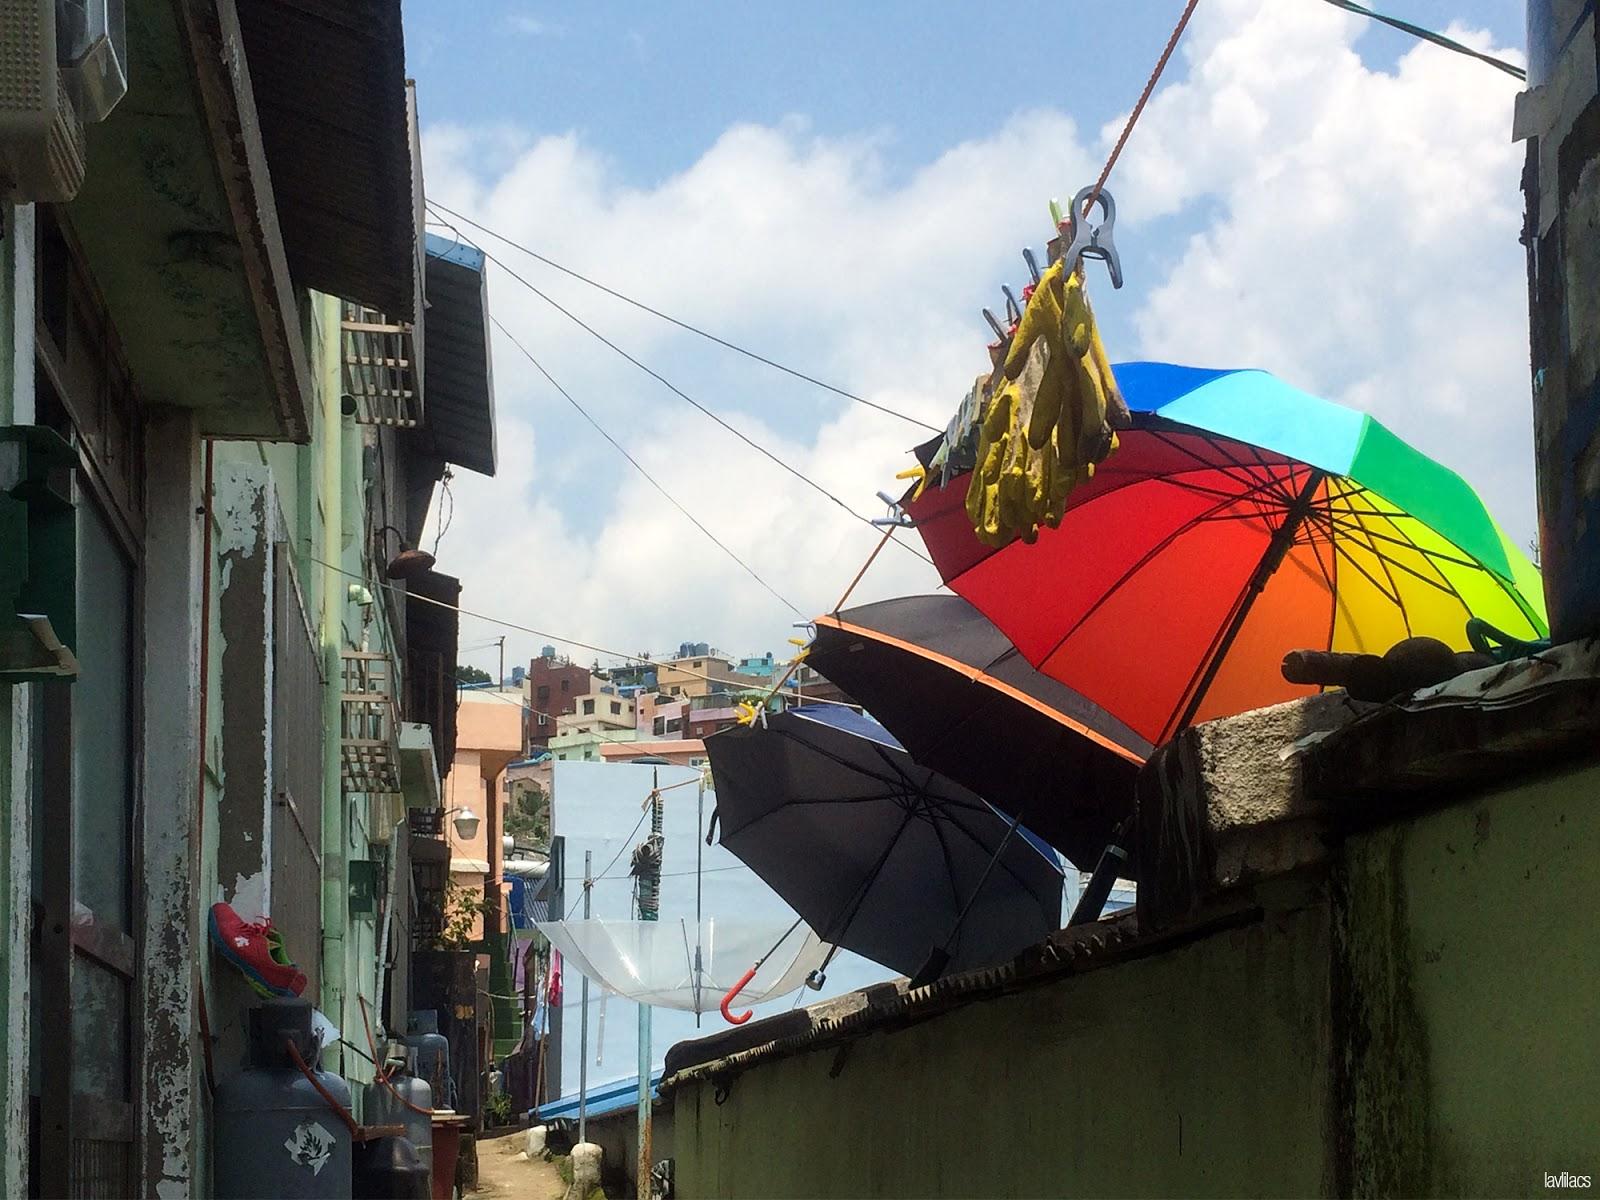 Seoul, Korea - Summer Study Abroad 2014 - Gamcheon Culture Village colorful umbrellas